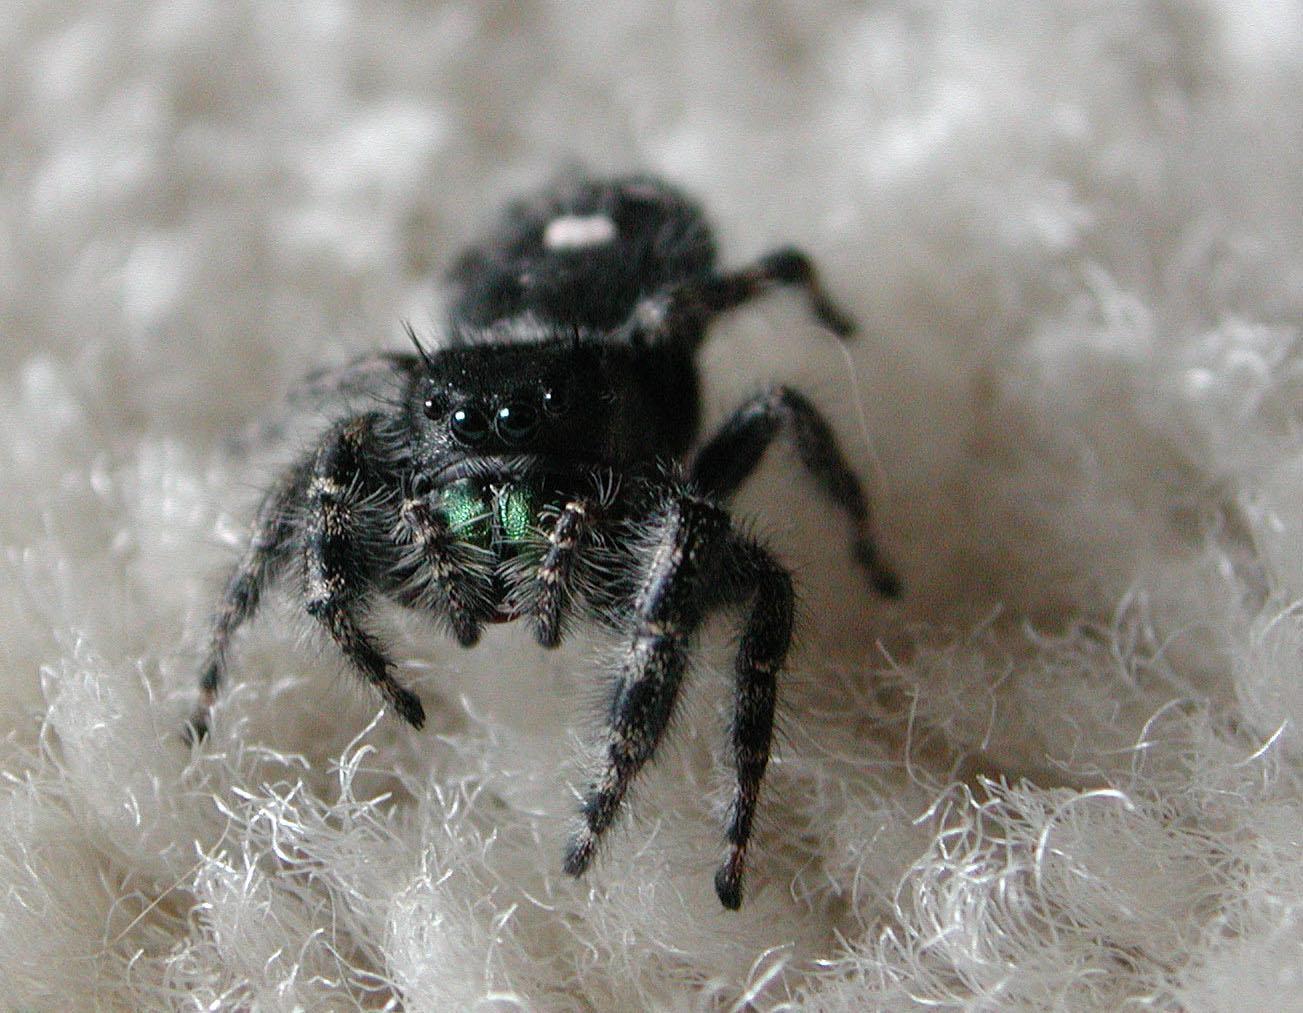 Ohio's biting spiders   spidersrule